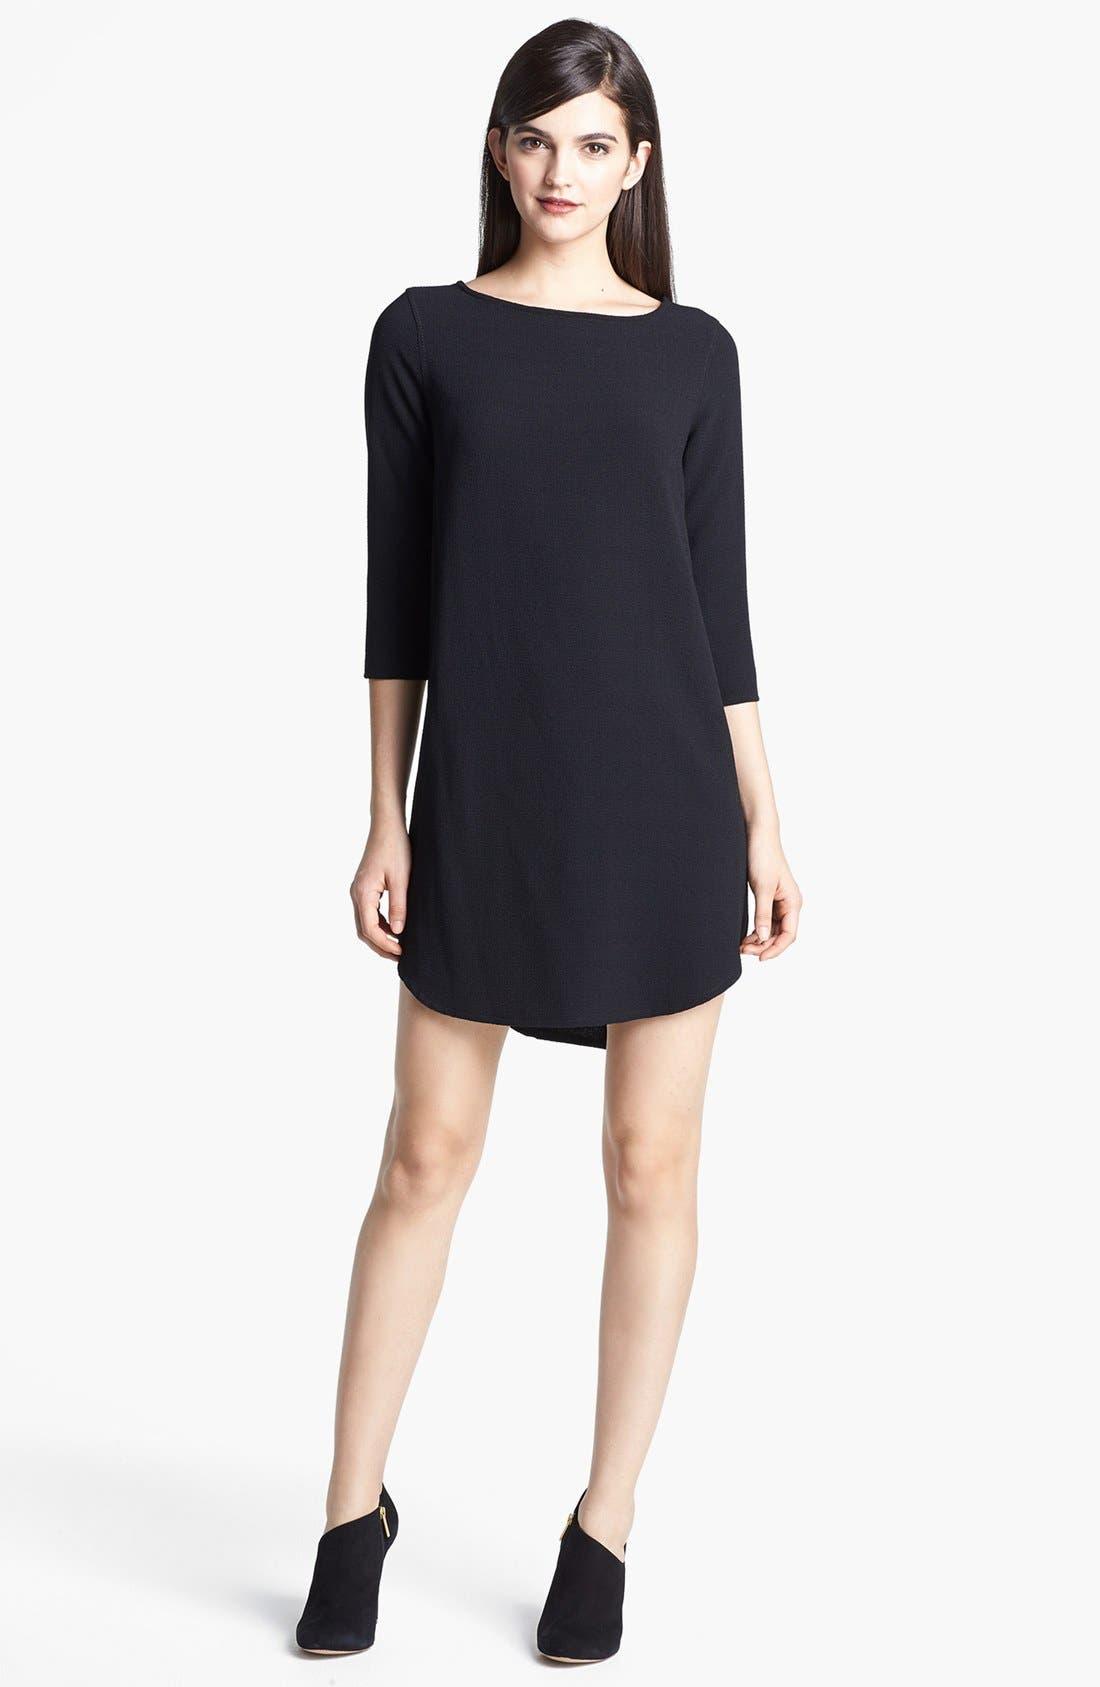 Main Image - BB Dakota 'Noland' Textured Crepe Dress